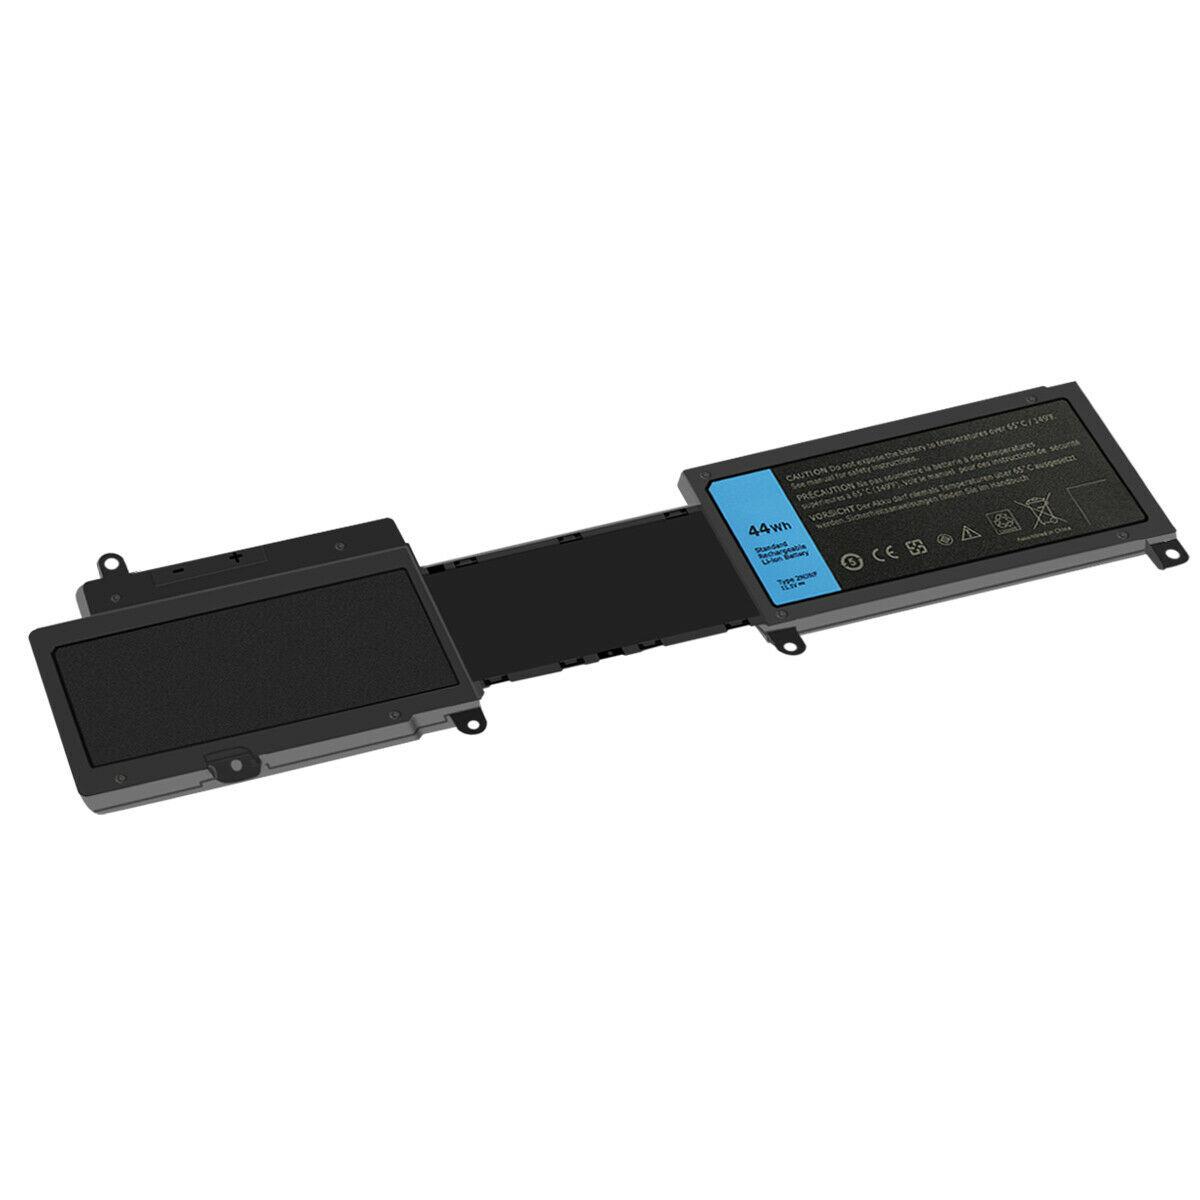 Dell Inspiron 3421,5421,Inspiron 15z (5523)2NJNF 8JVDG T41M0 TPMCF compatible battery